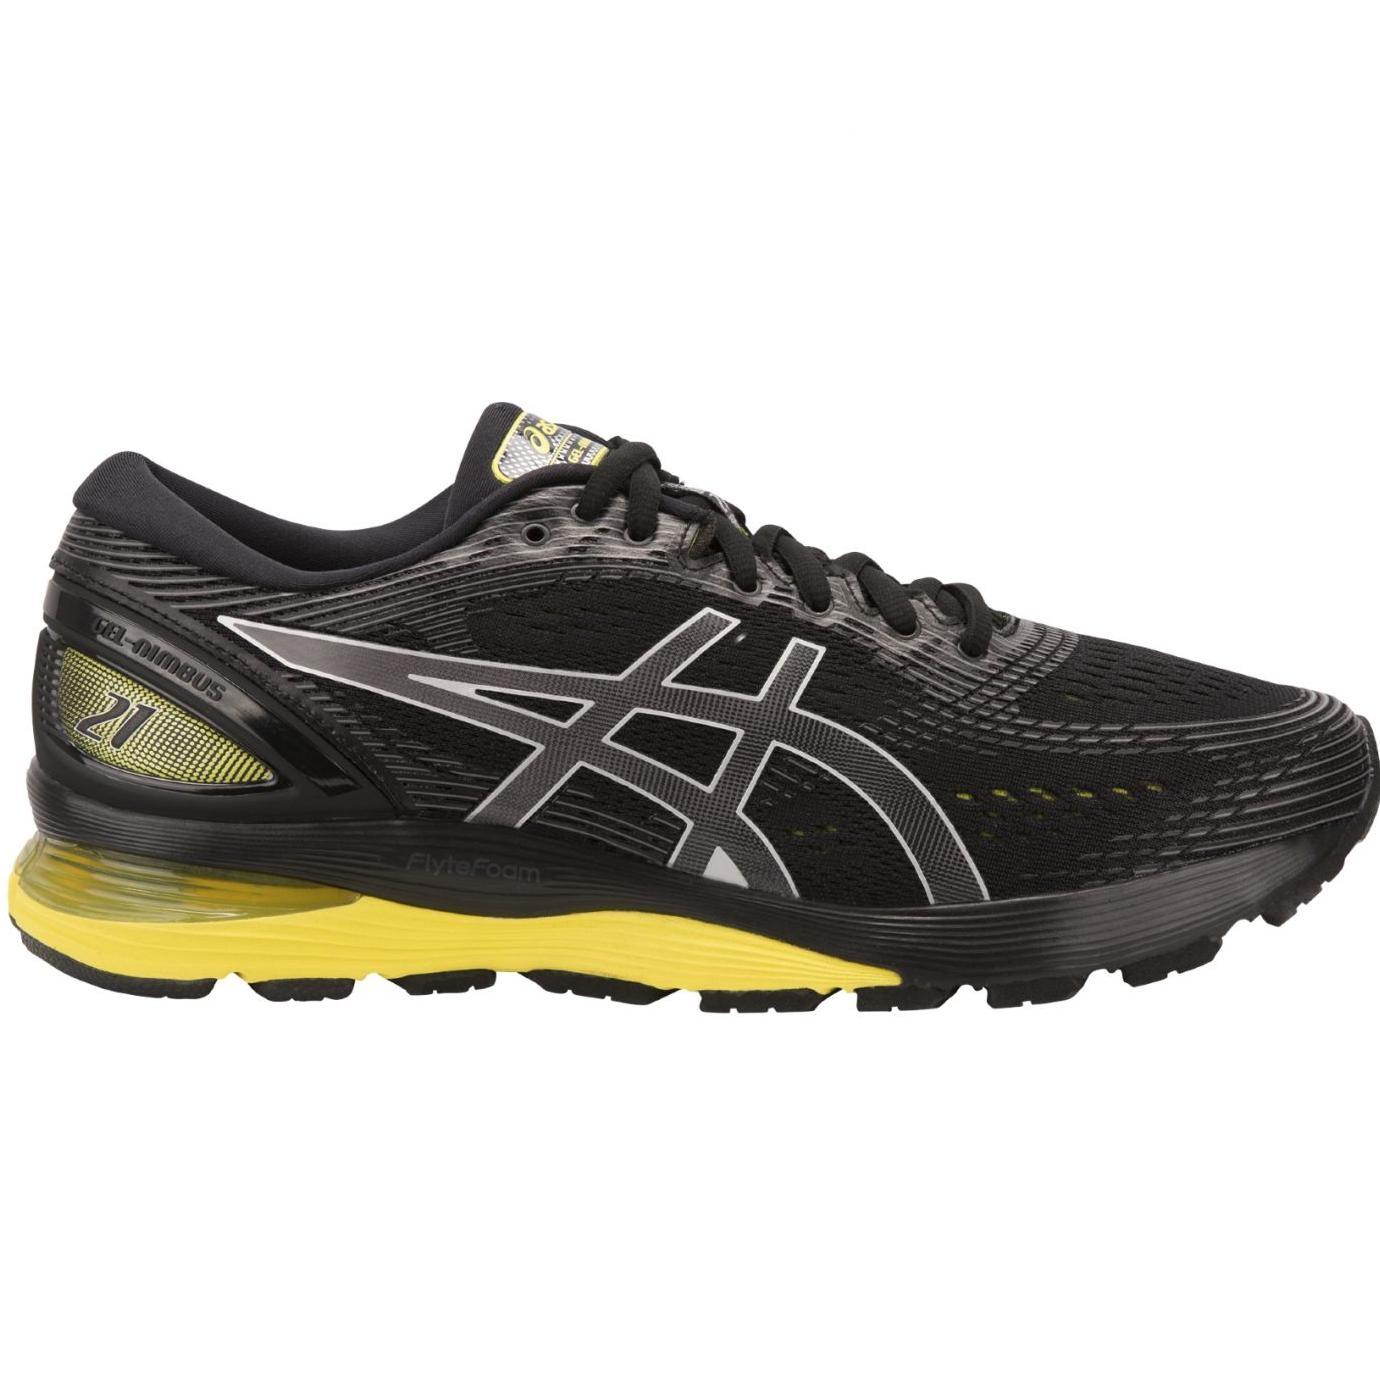 Details zu Asics Gel Nimbus 21 Laufschuhe Herren Running schwarz gelb 1011A169 003